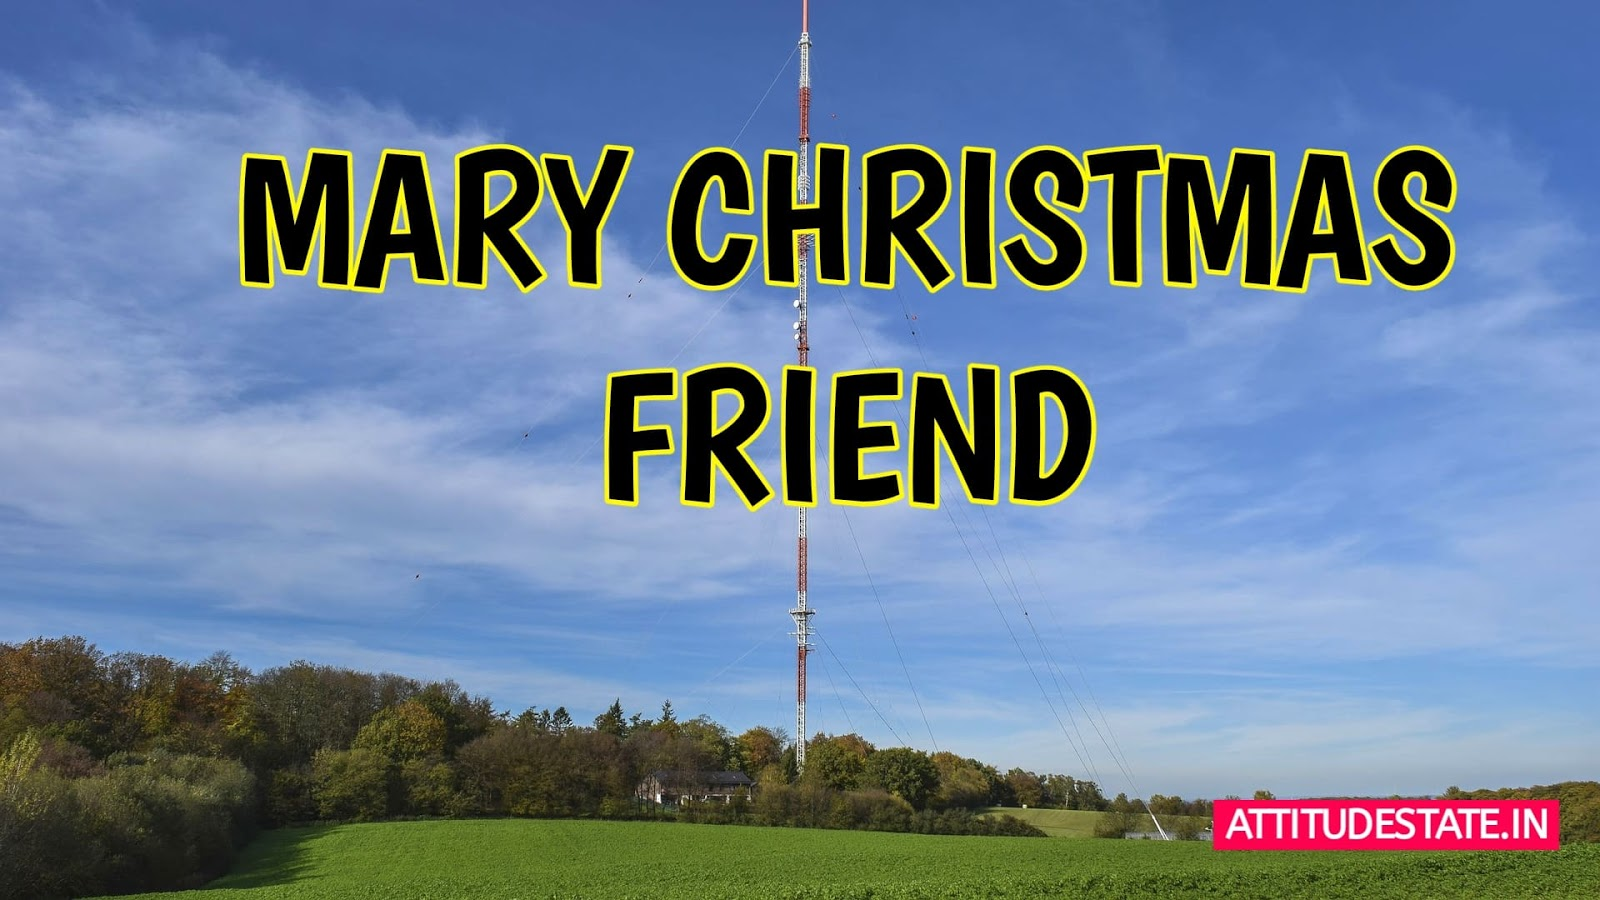 merry christmas 2019 status